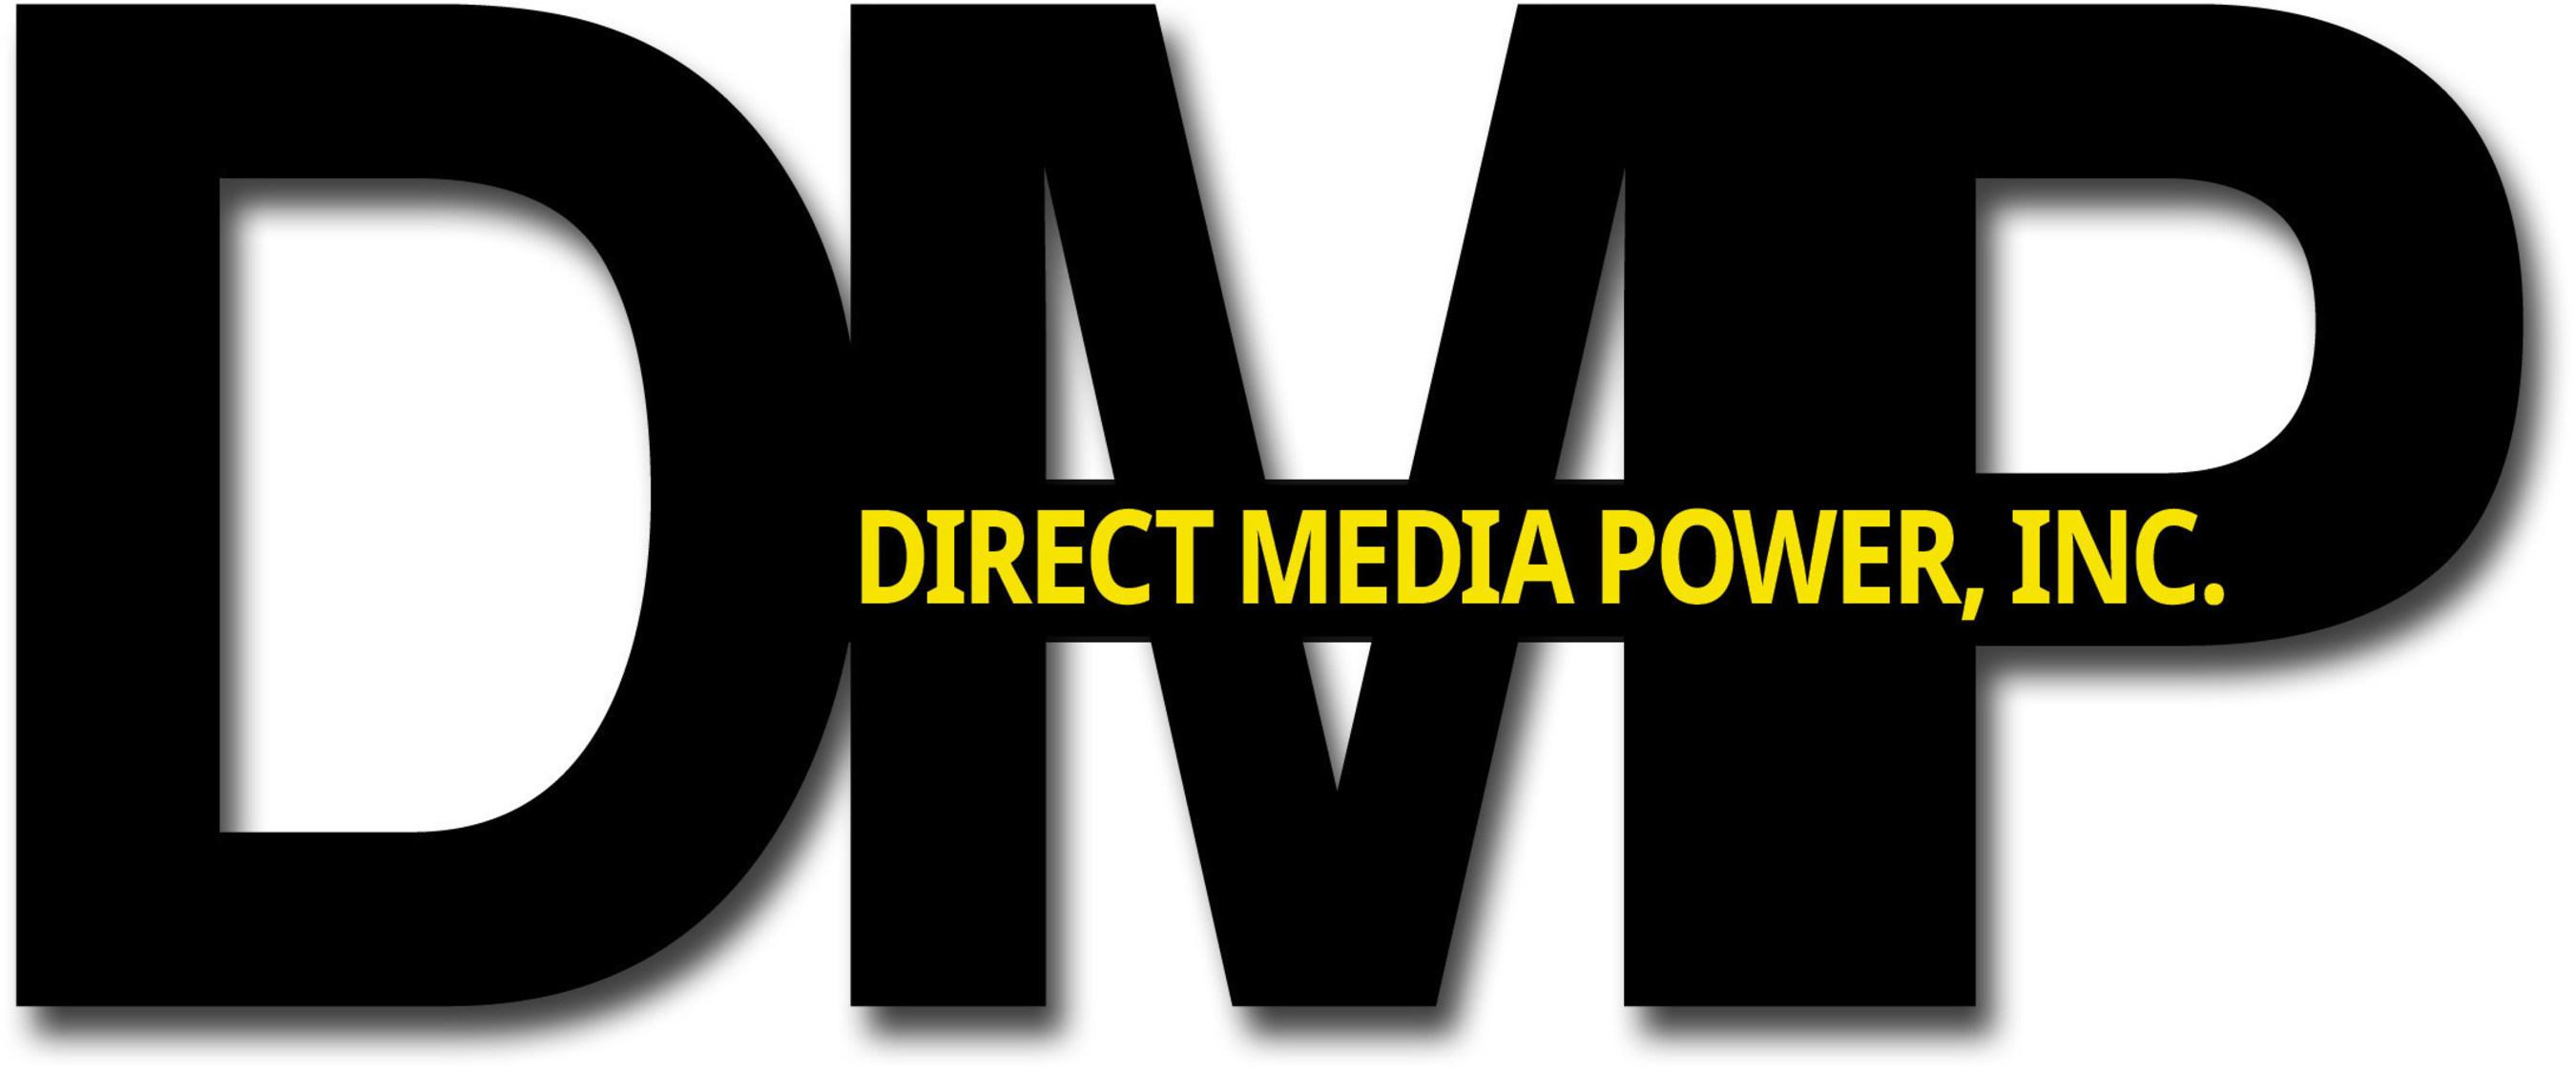 Direct Media Power, Inc.